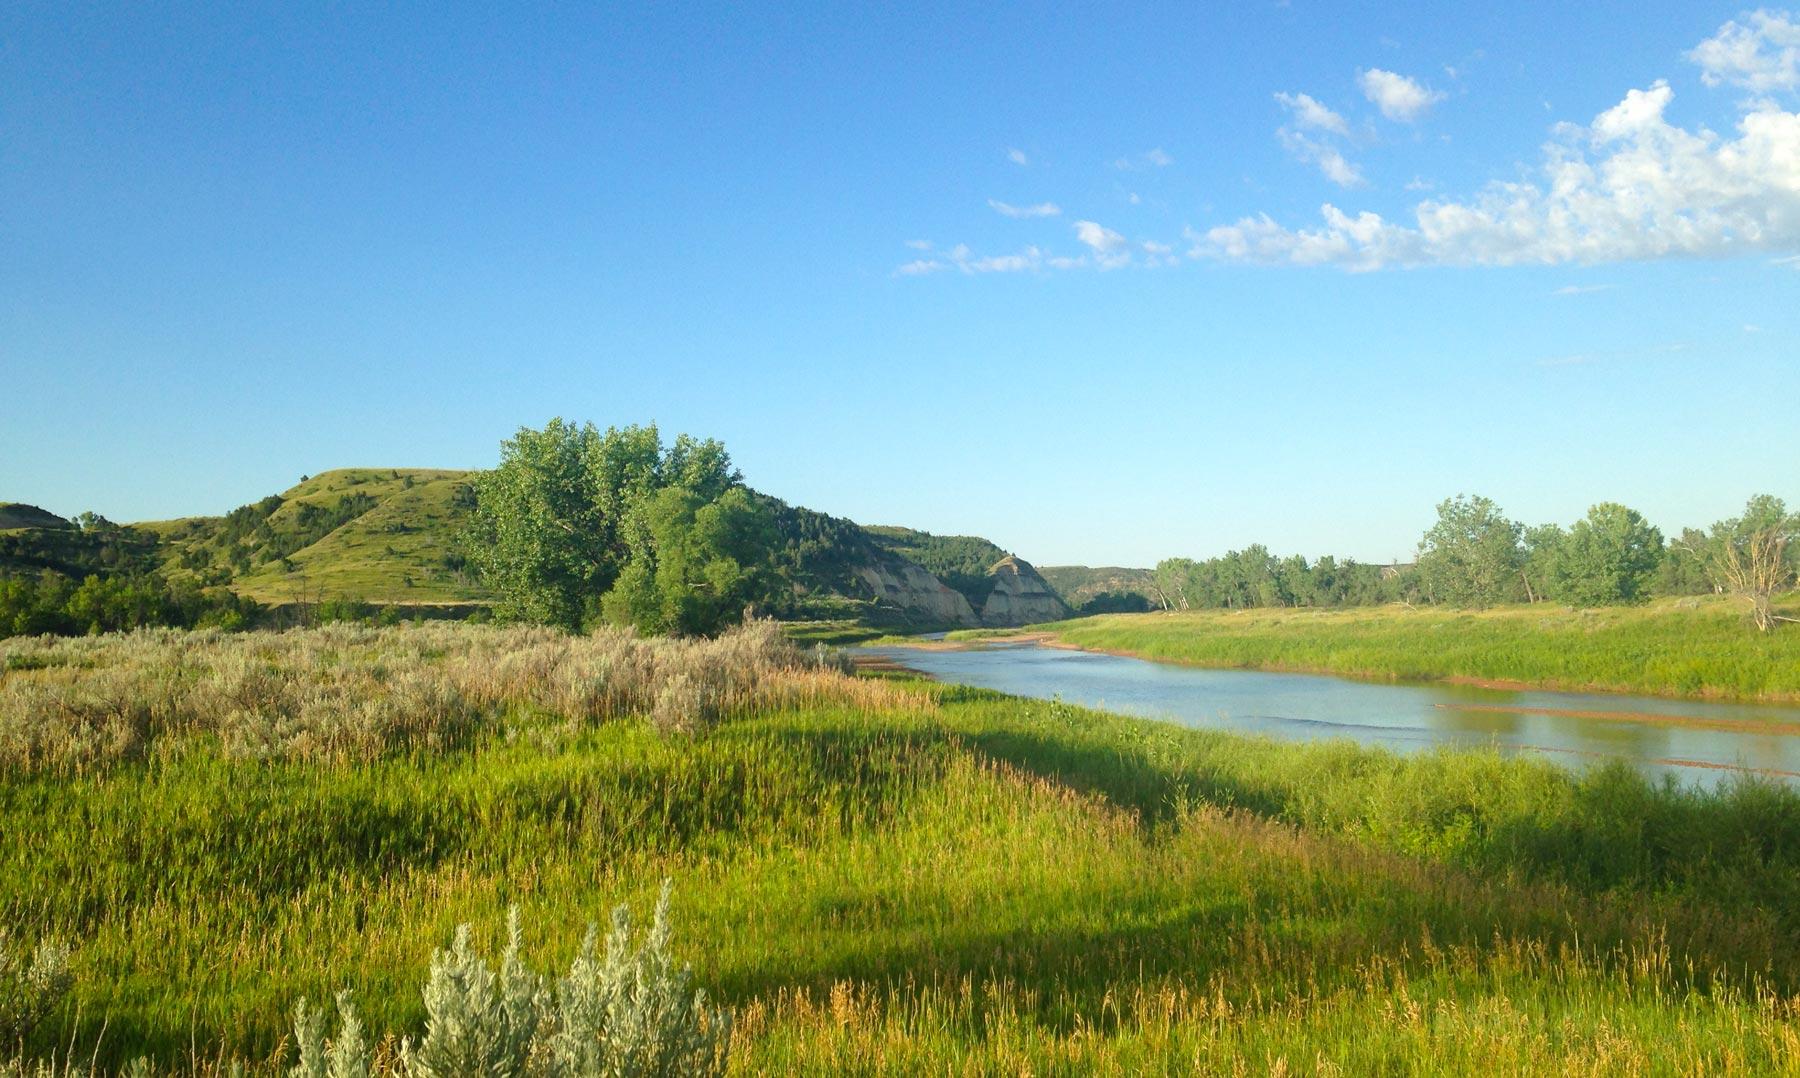 Cottonwood Campground campsite overlooking Little Missouri River in Theodore Roosevelt National Park, North Dakota